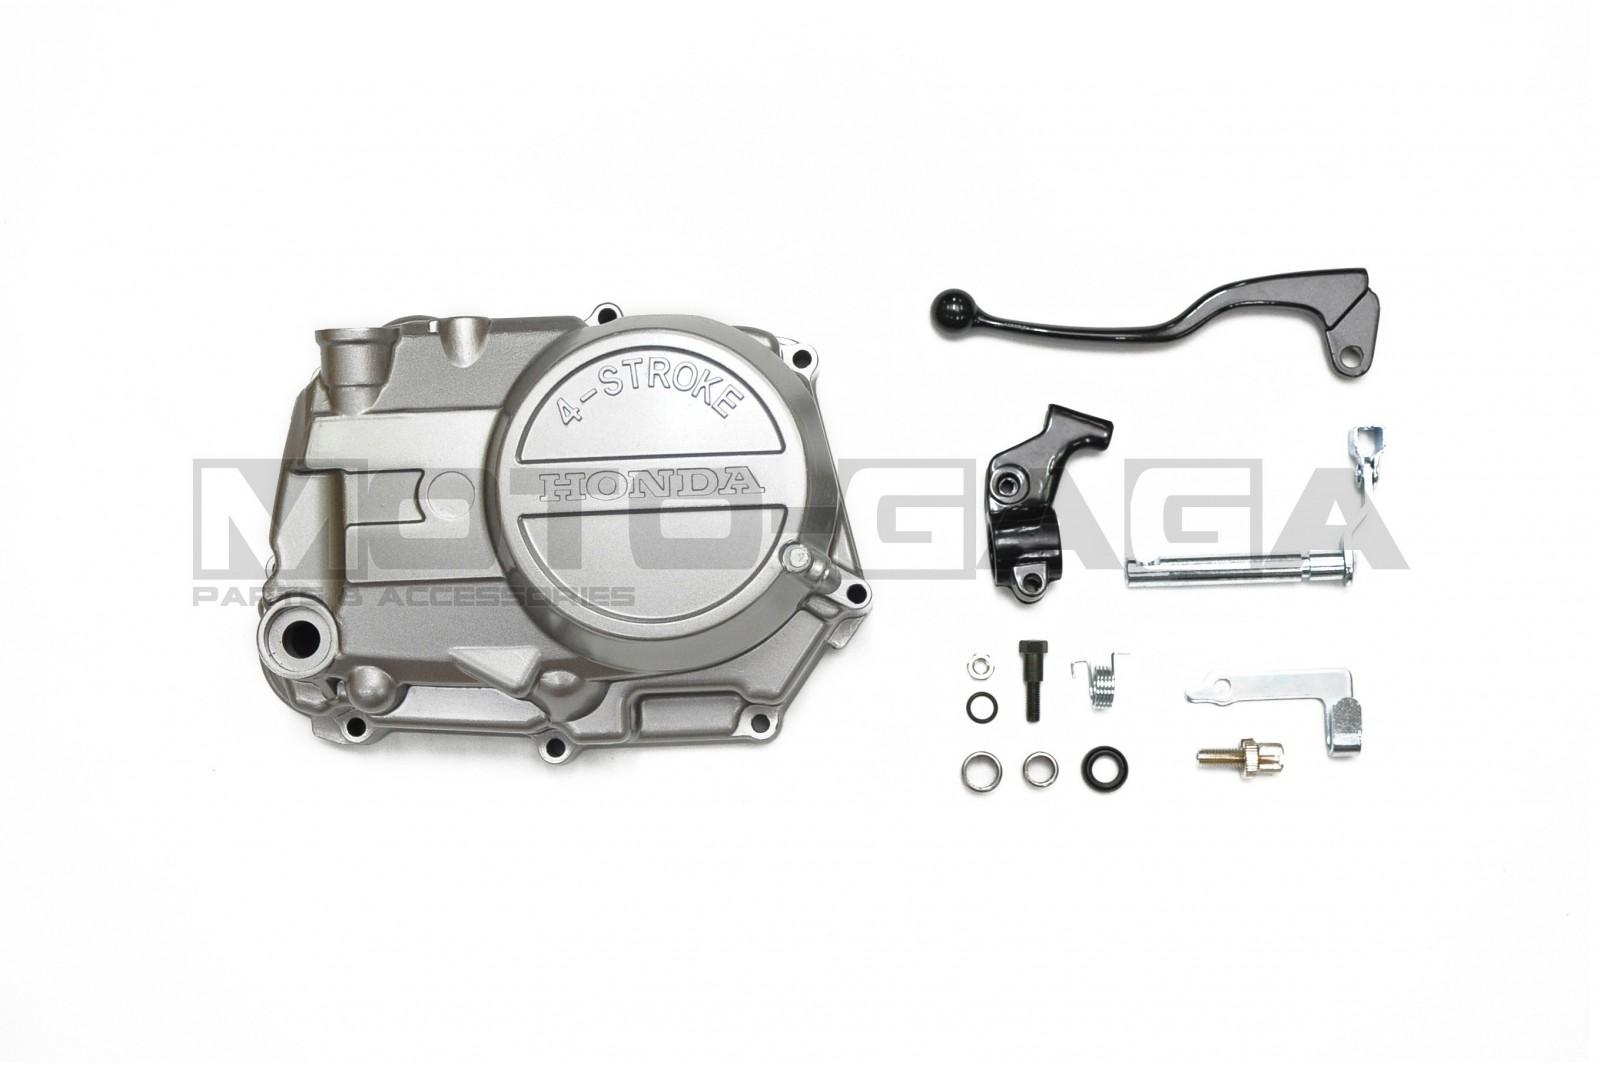 Honda Cub c100/ Astrea/ Citi 100 Dream Manual Hand Clutch